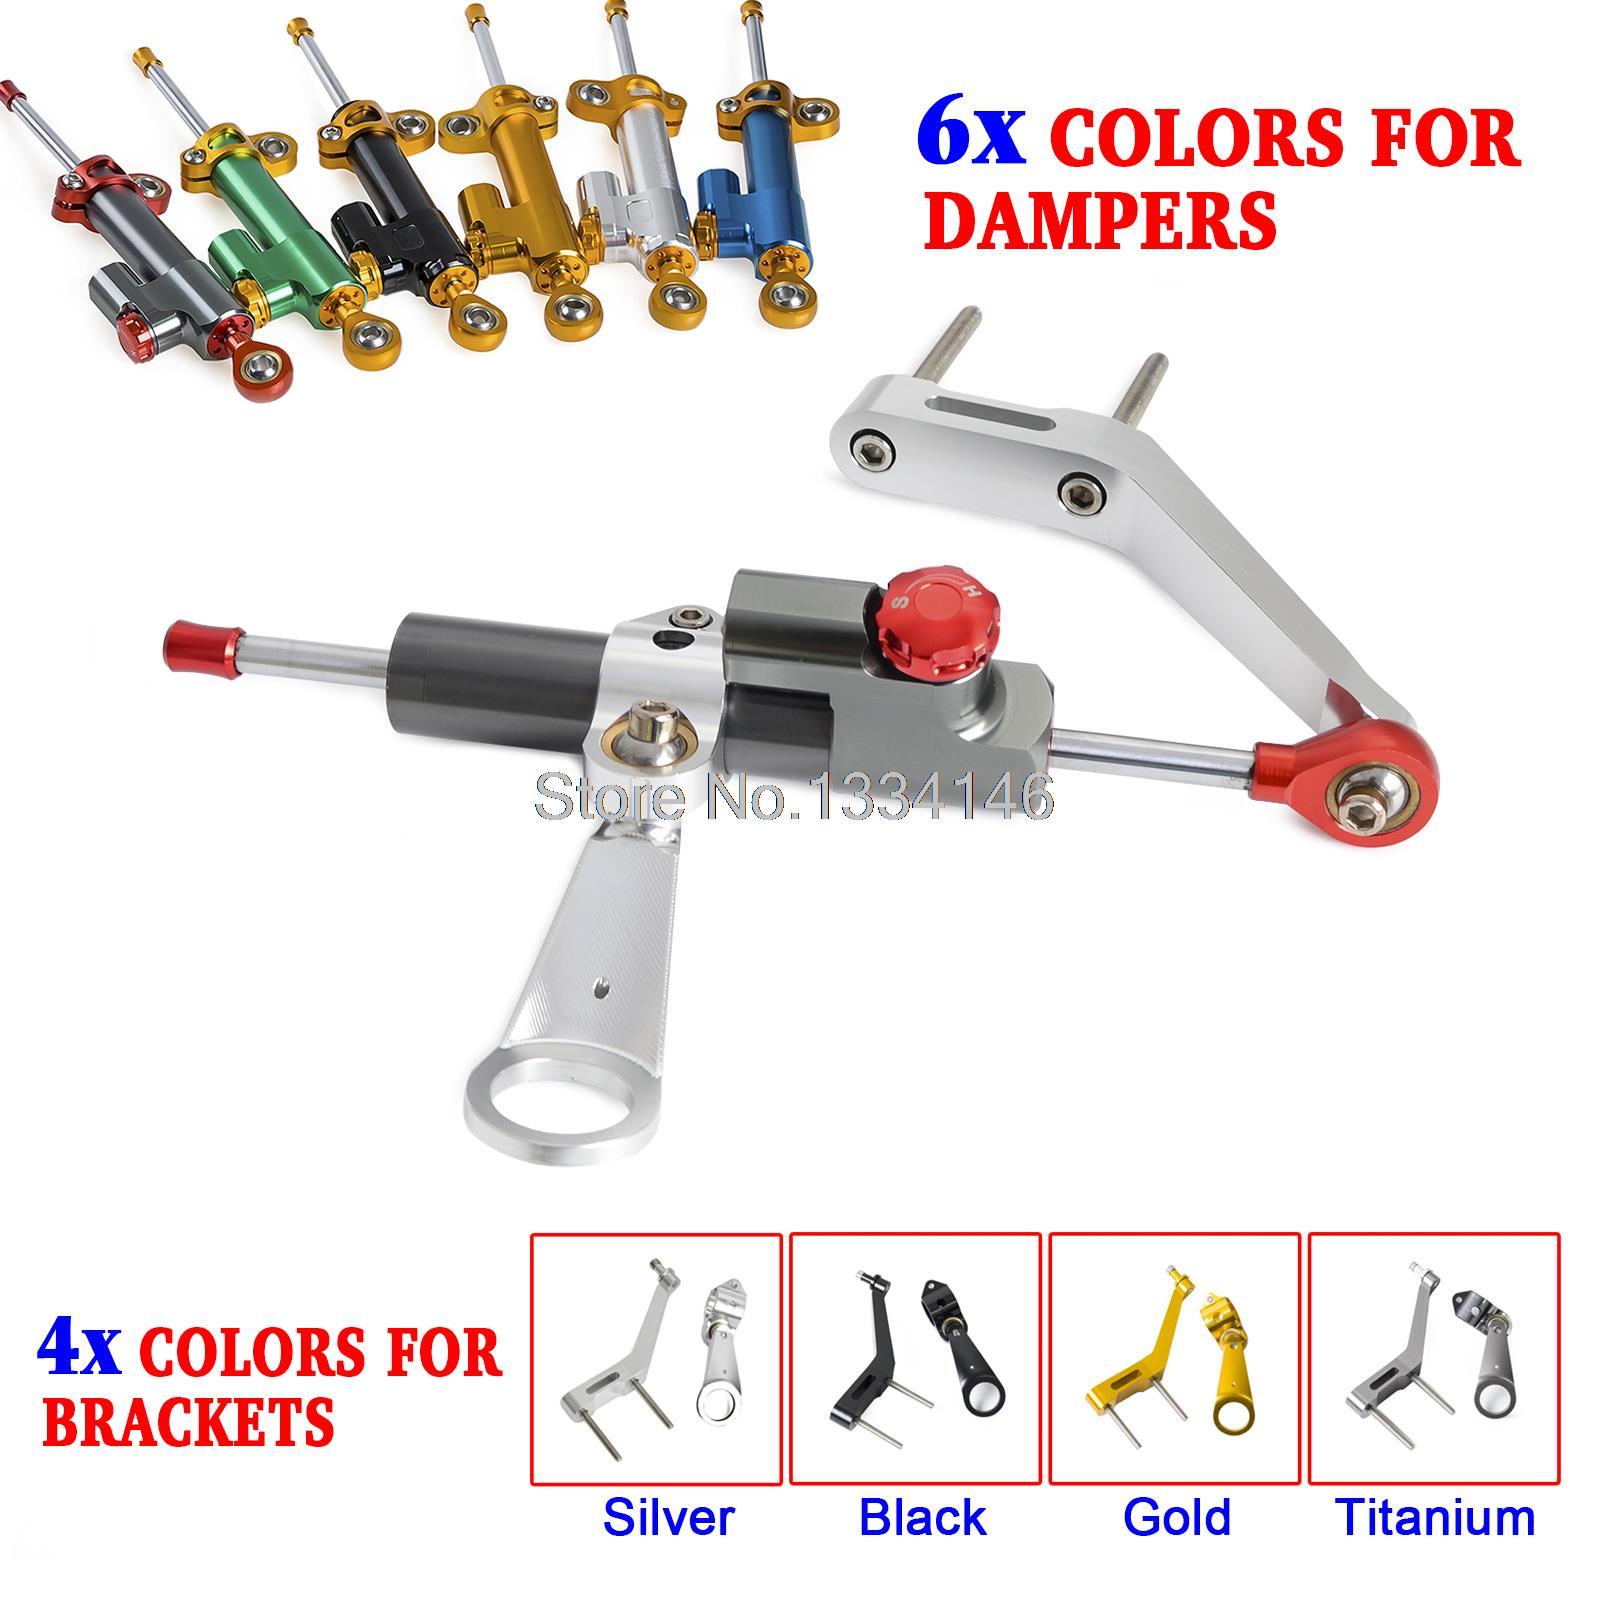 цена на New Sliver CNC Steering Damper Stabilizer & Bracket Kit For Honda CBR954RR 2002 2003 Motorcycle